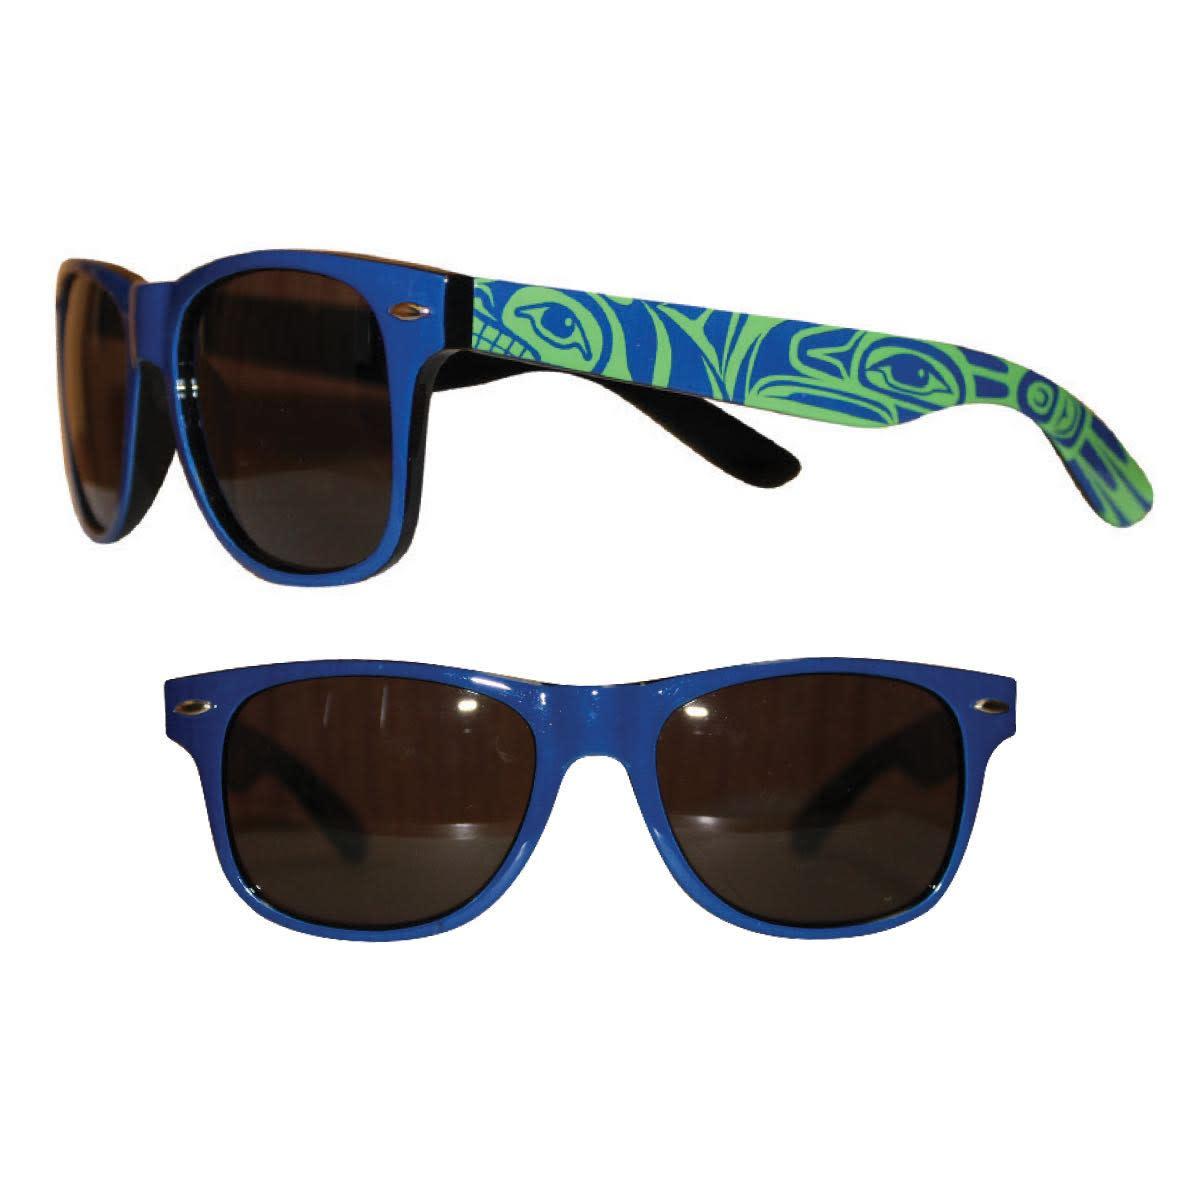 SunGlasses - Adult-7